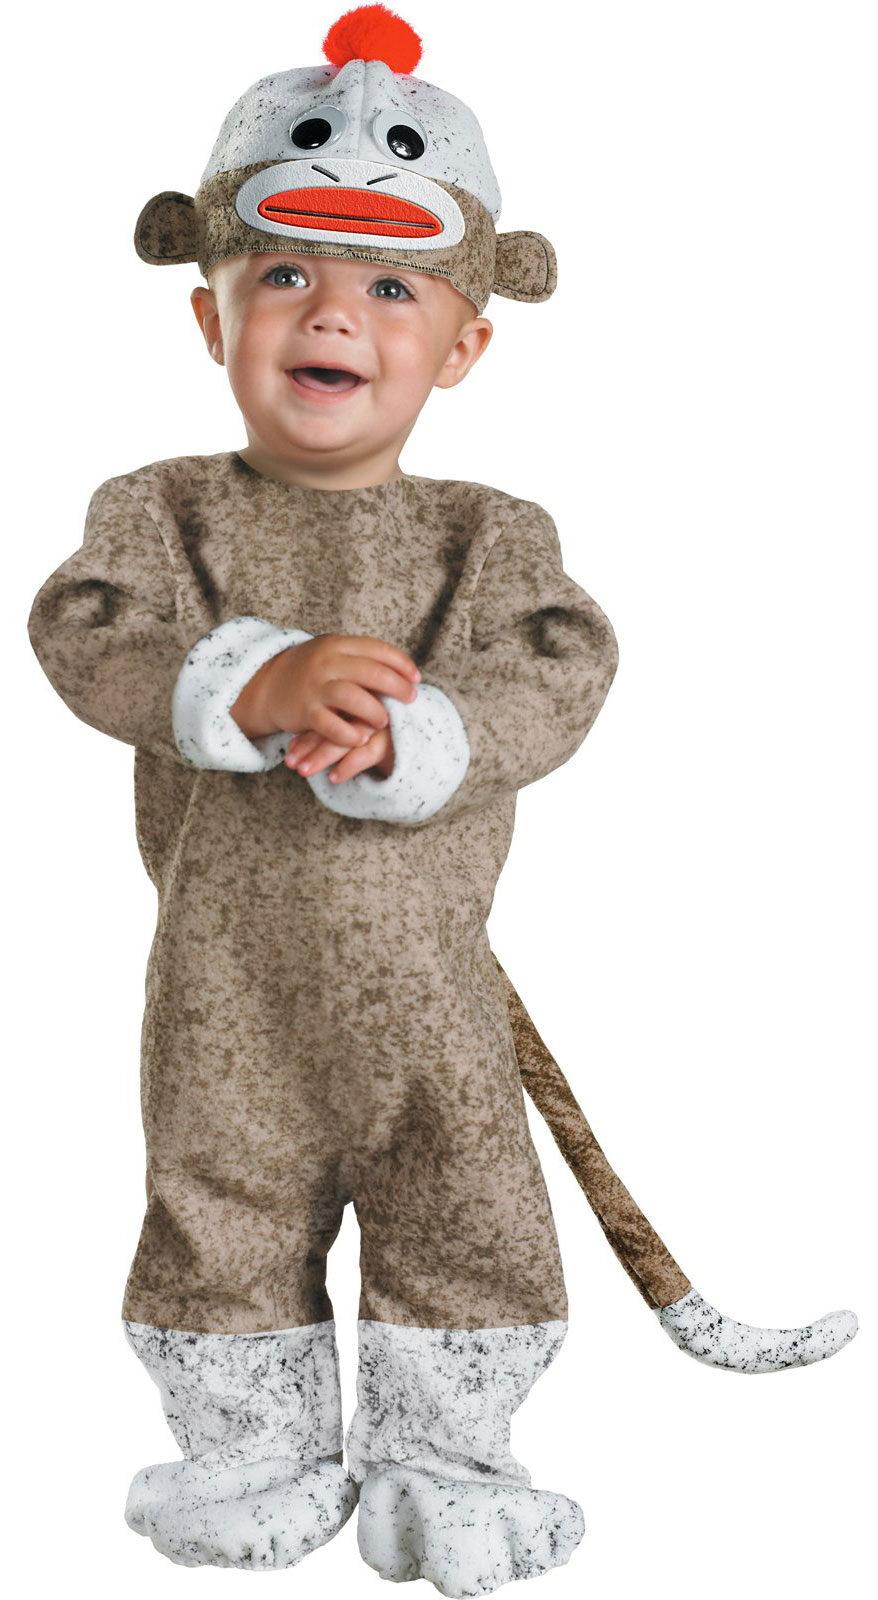 Infant Woody Costume   Yoyoworld Halloween Baby Boysu0027 Woody ... 9fb75719033